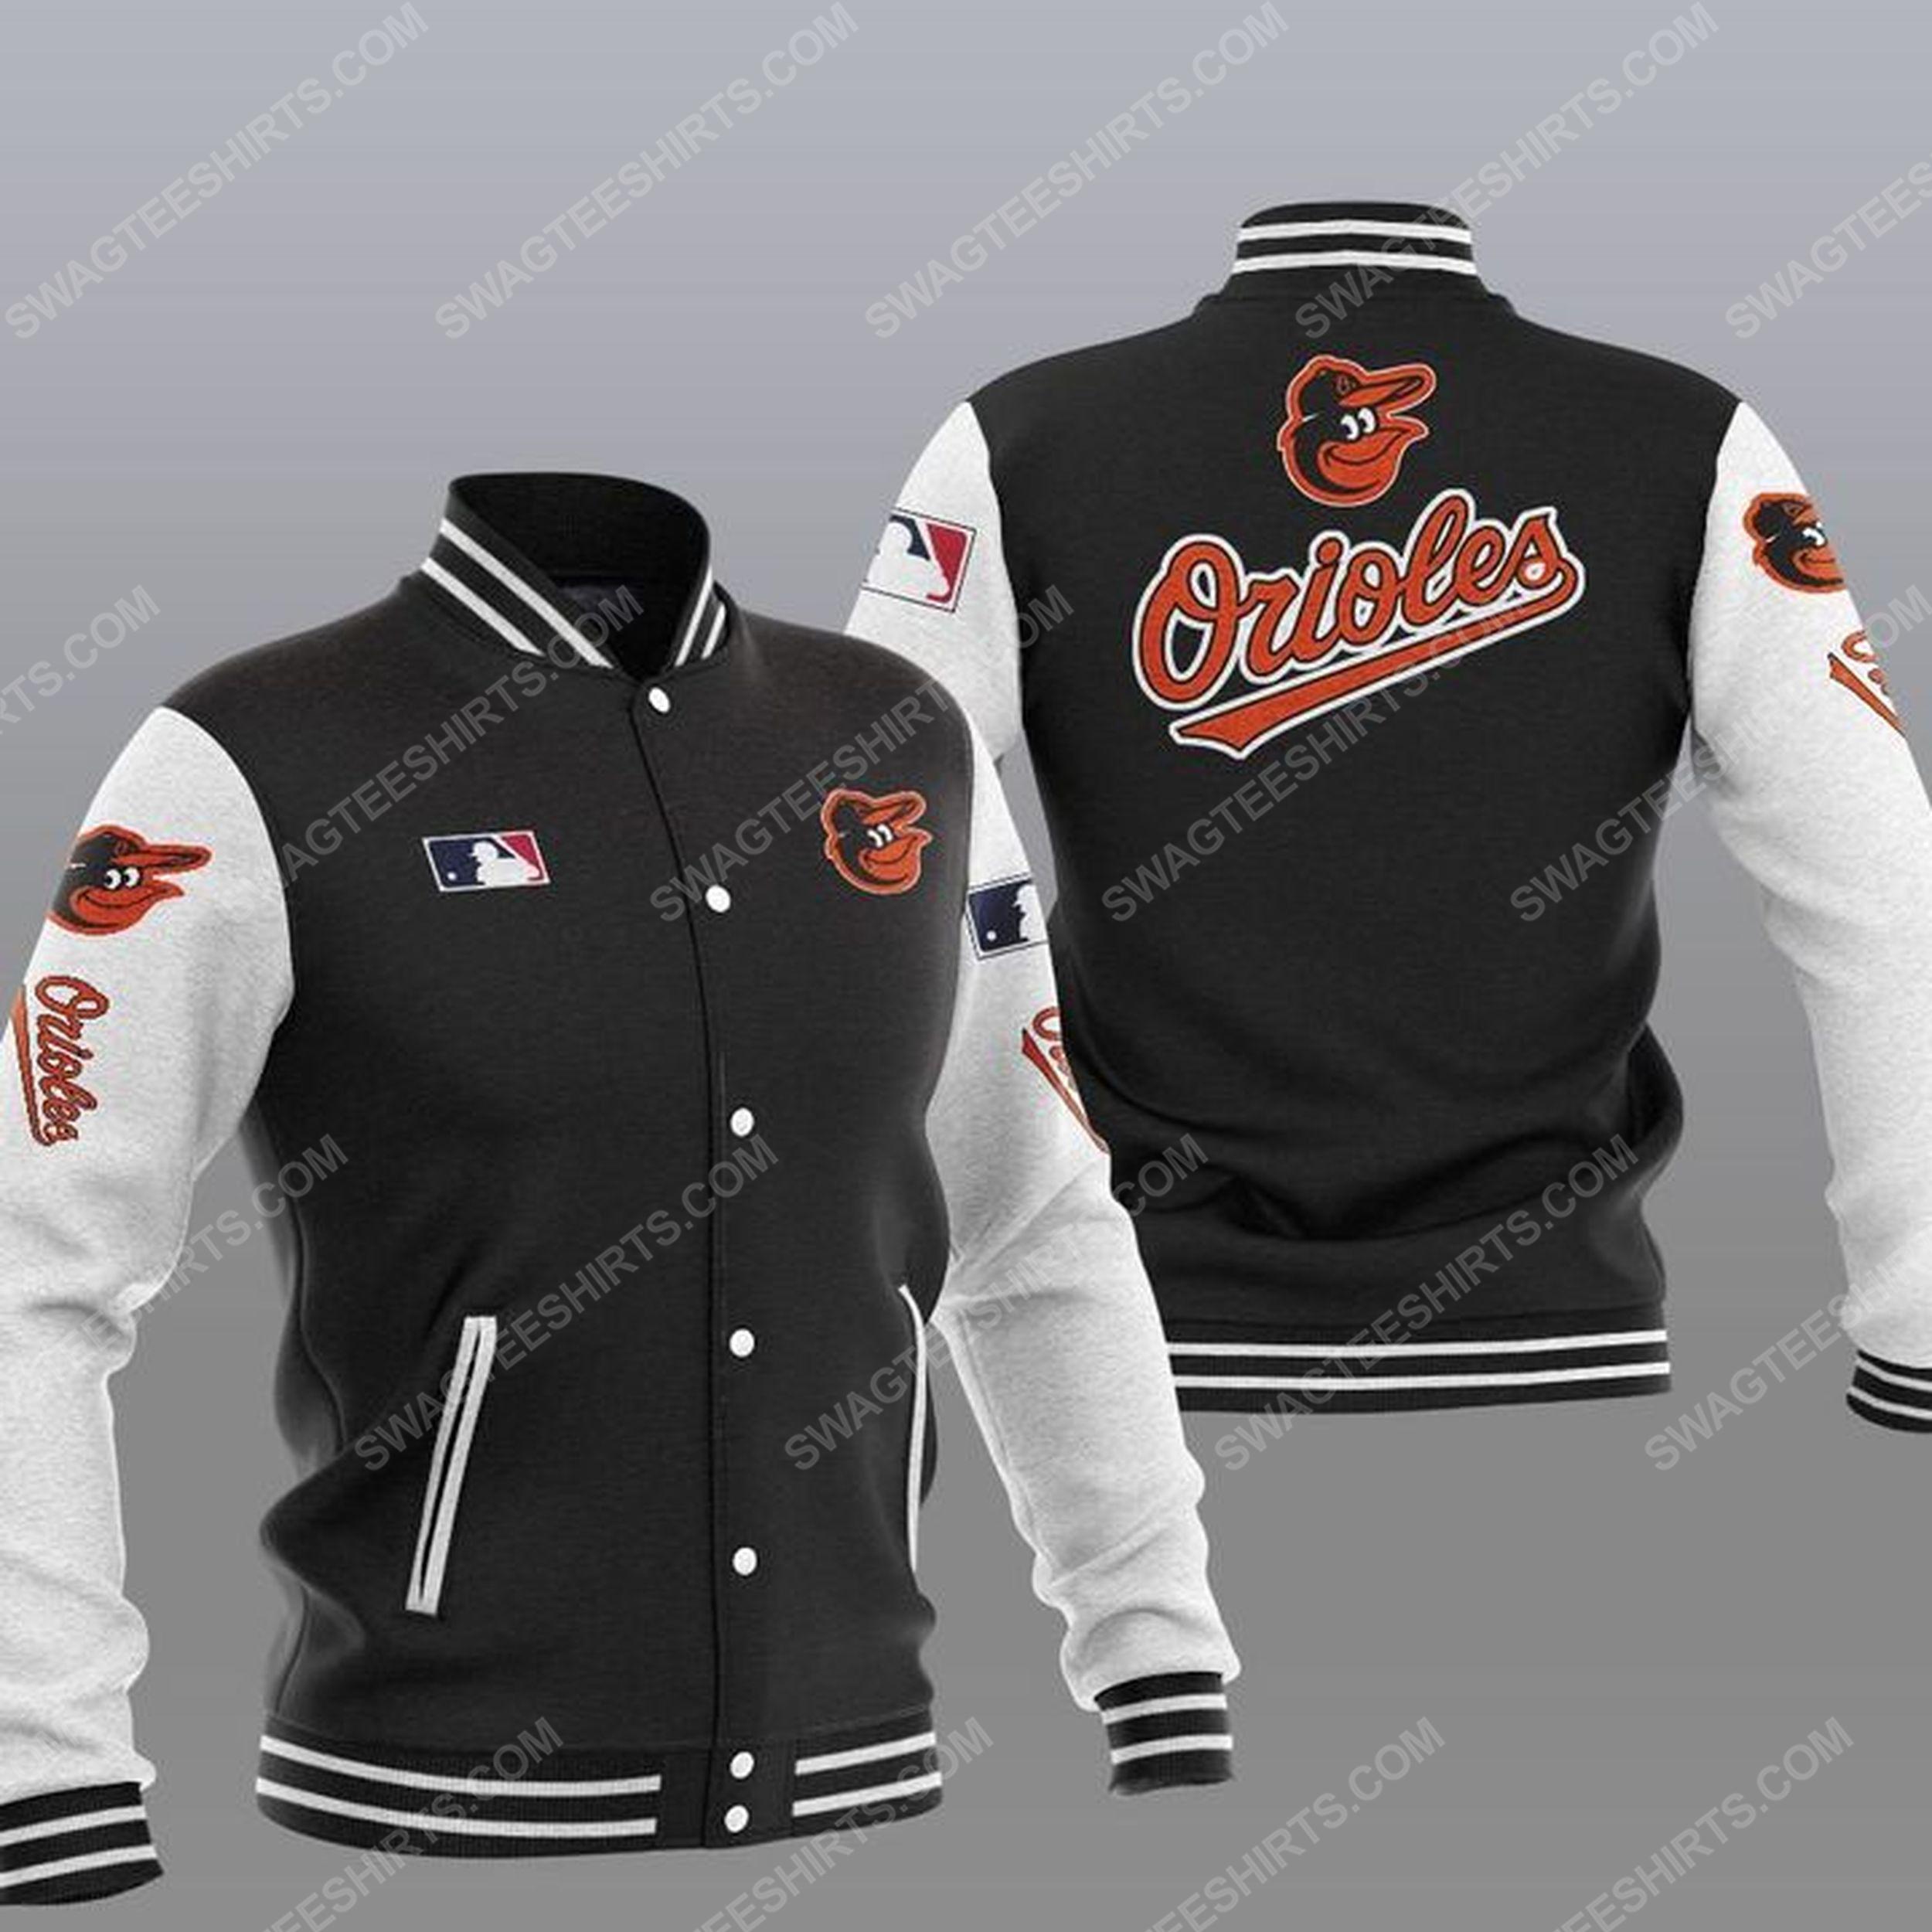 The baltimore orioles mlb all over print baseball jacket - black 1